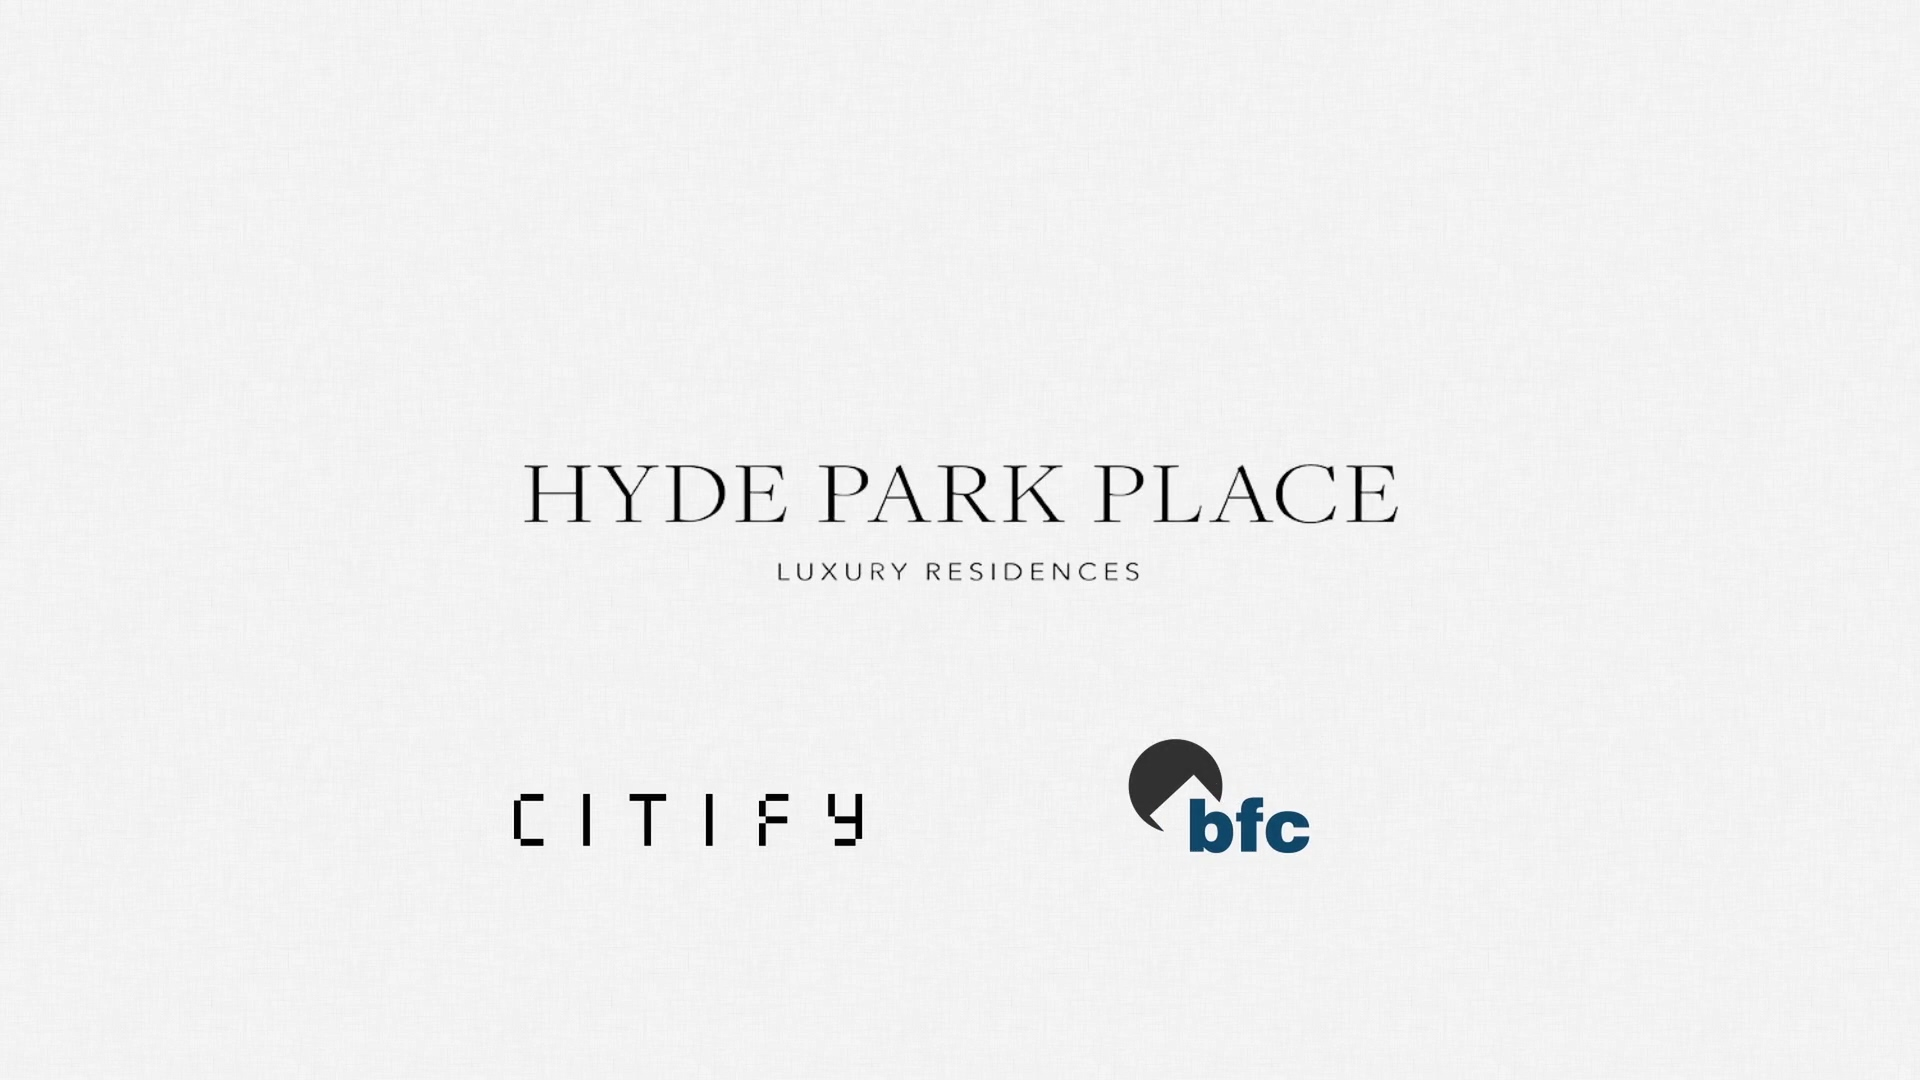 Citify - Hyde Park - December 2019